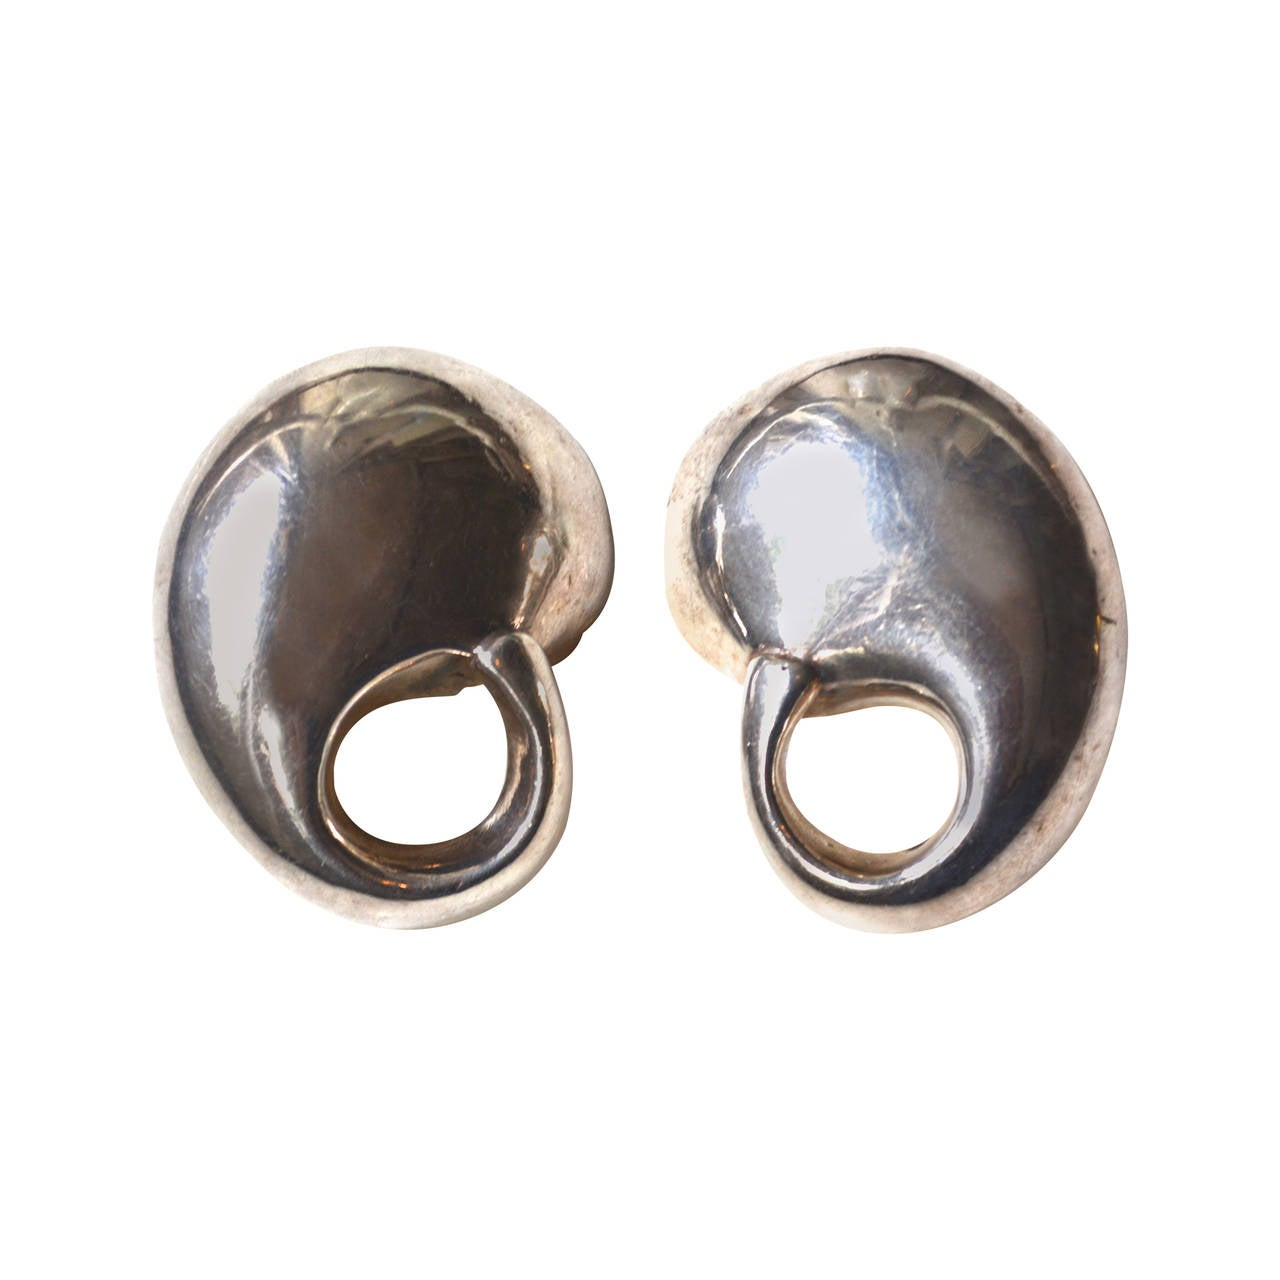 Organic Mod Sterling Earrings For Sale